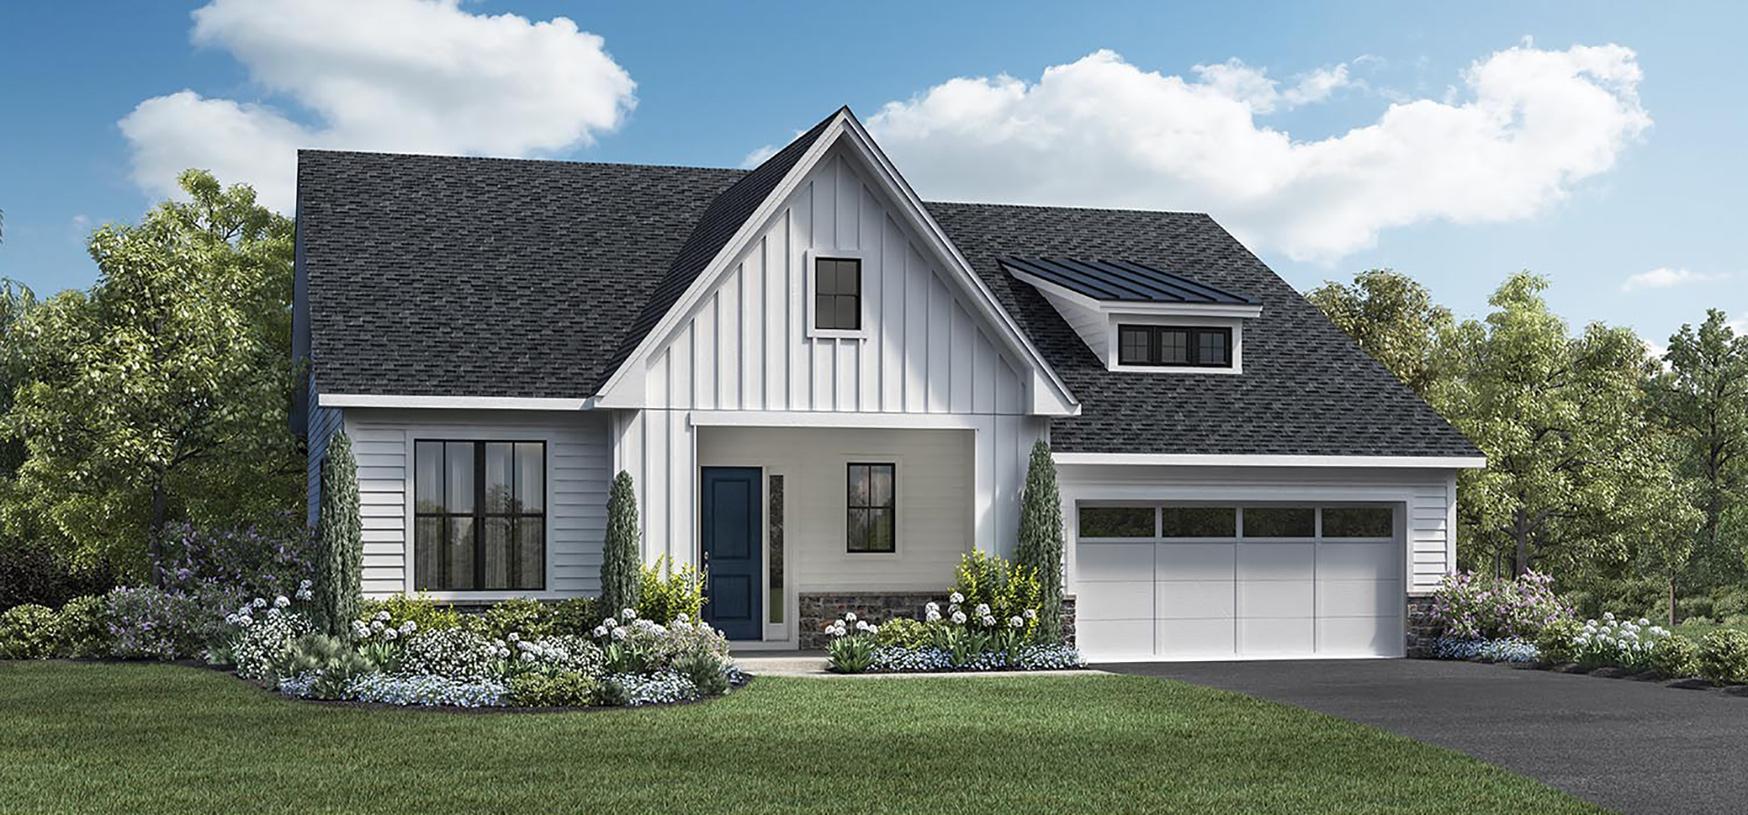 Bayhill -  Modern Farmhouse